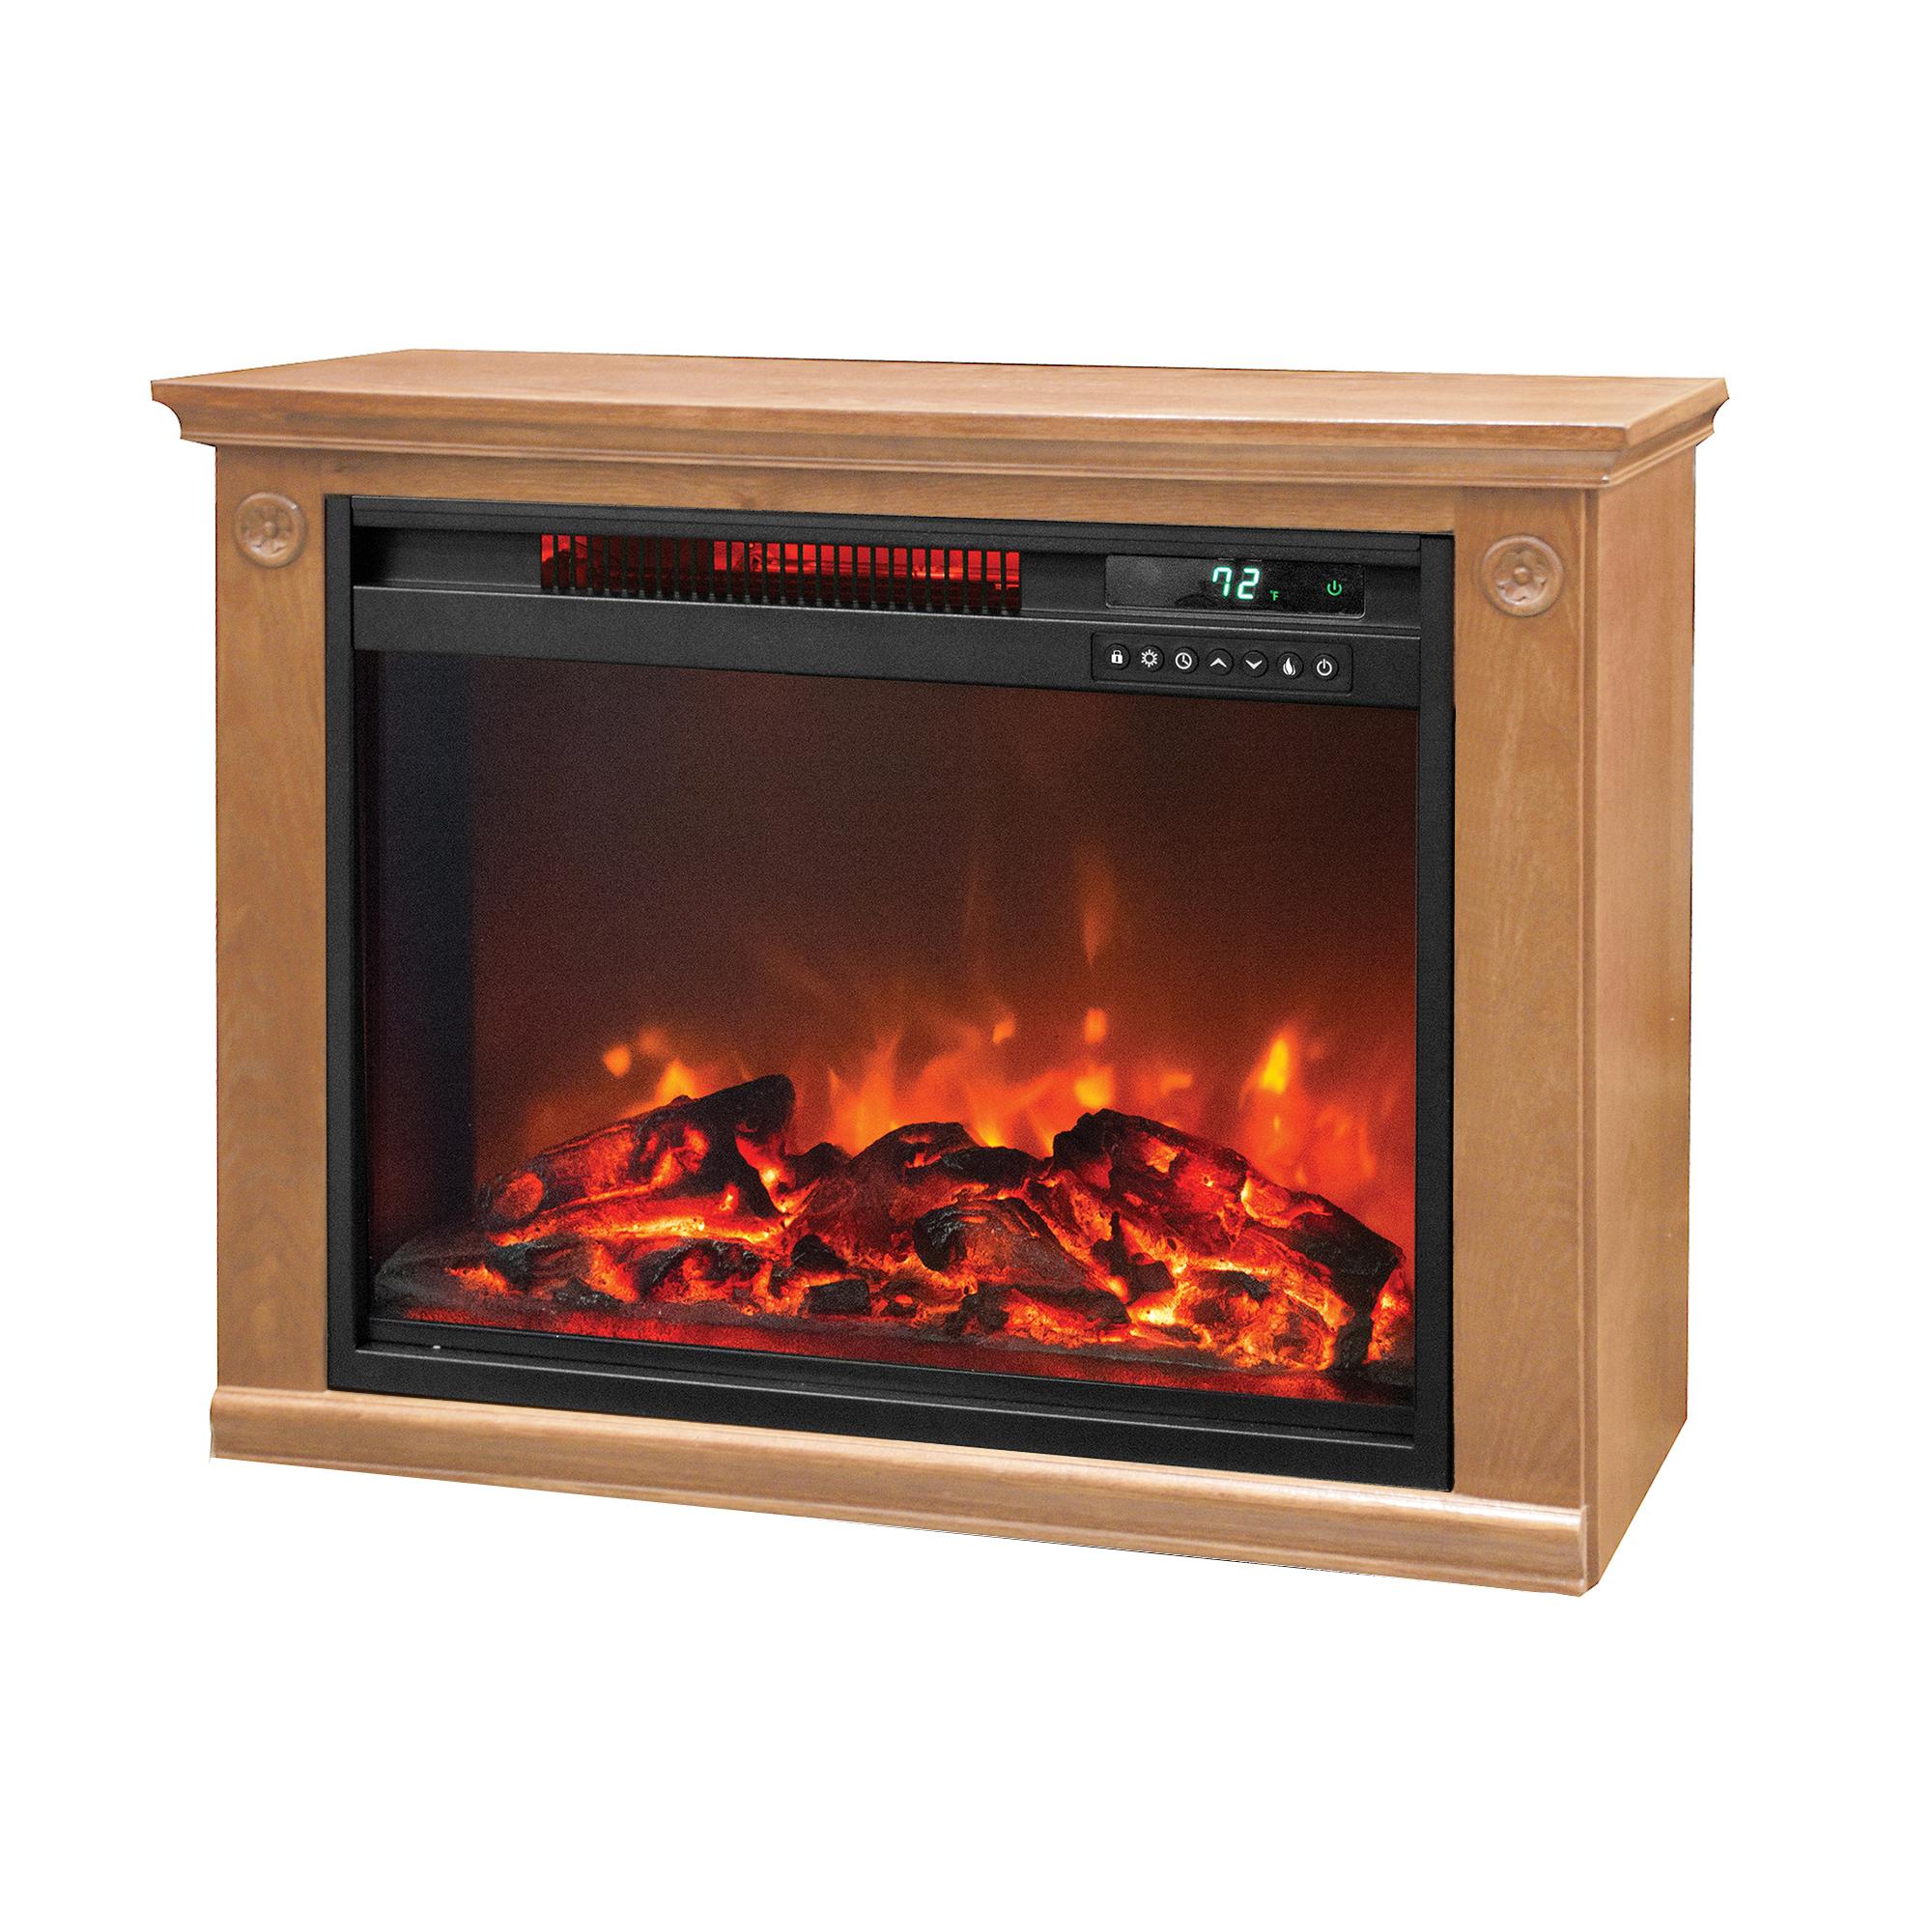 Lifesmart 1500 Watt Large Infrared Quartz Electric Fireplace Heater Open Box